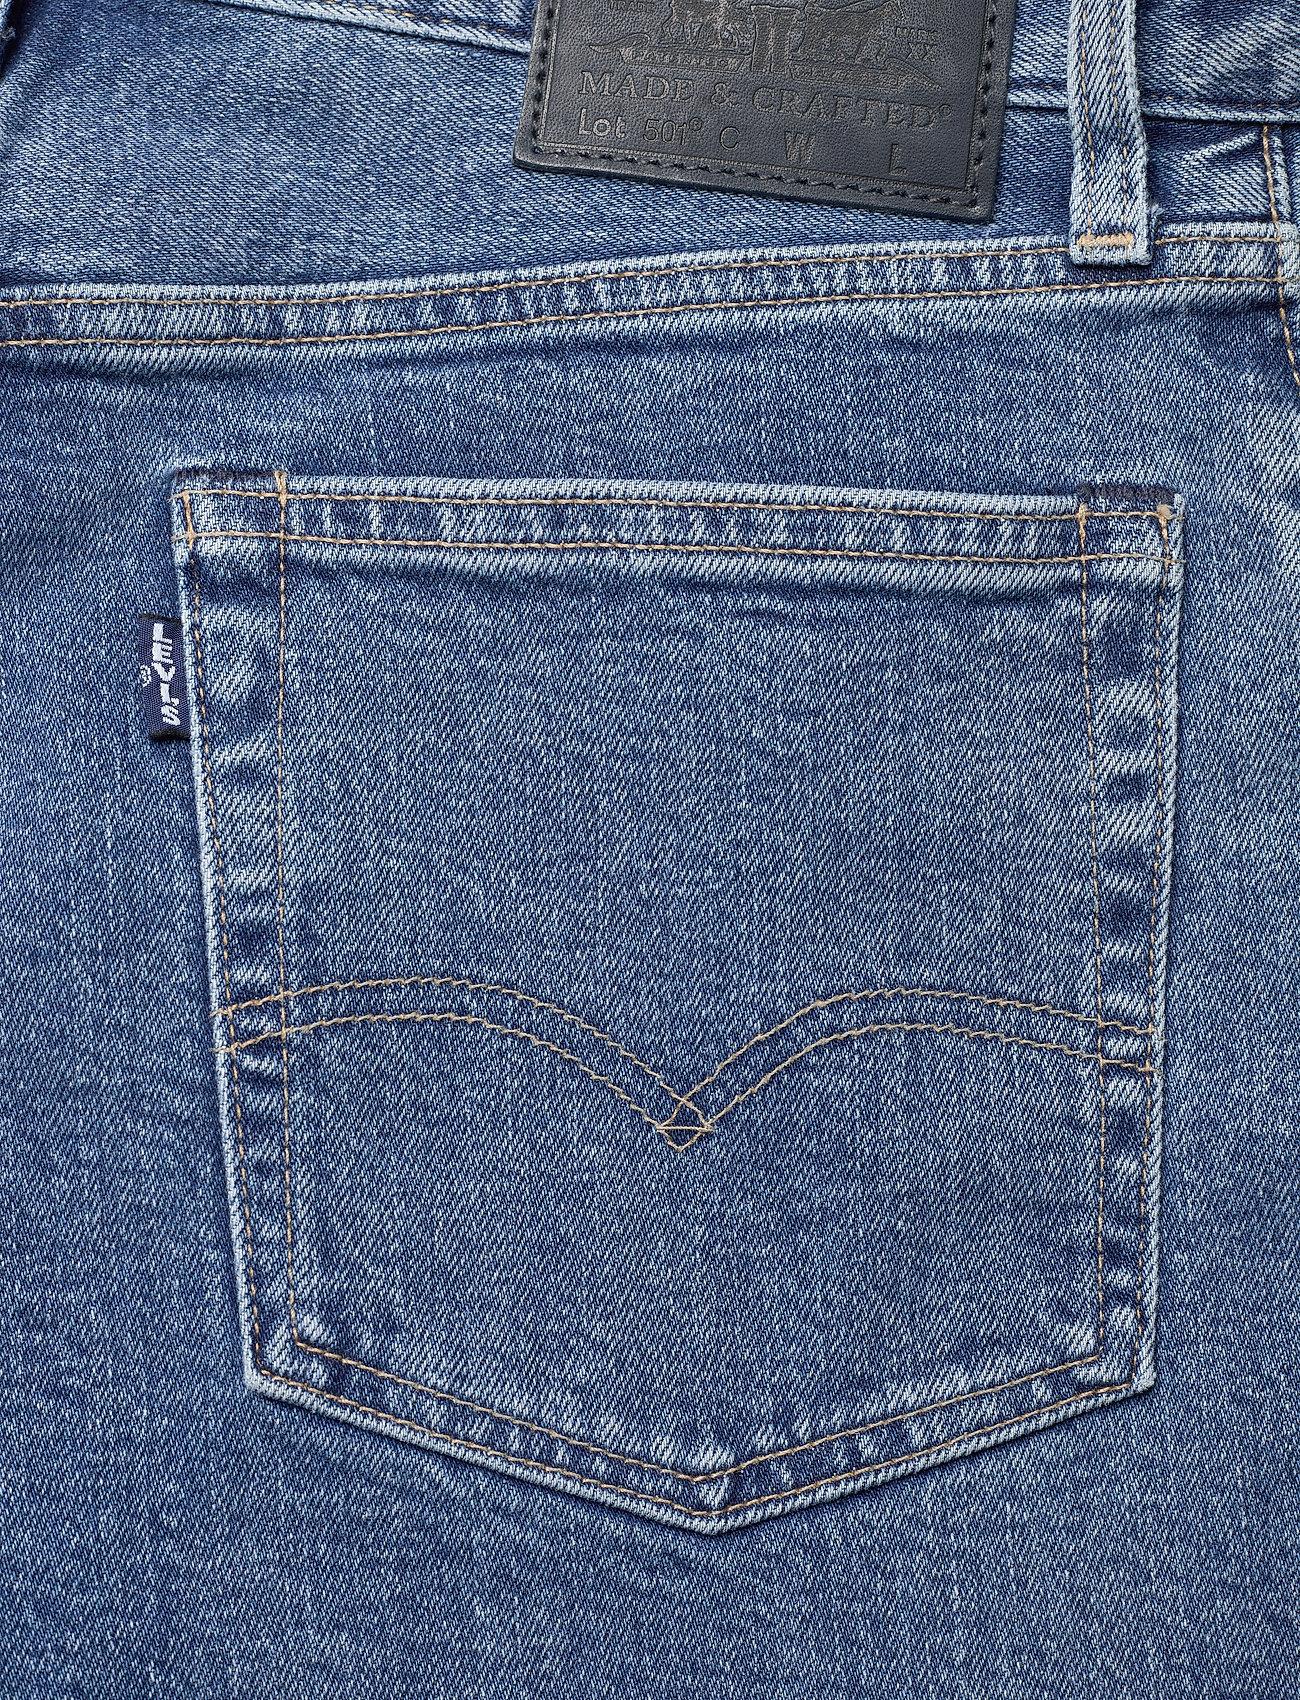 Levi's Made & Crafted - 501 CROP LMC CLIFFSIDE - straight regular - med indigo - worn in - 4